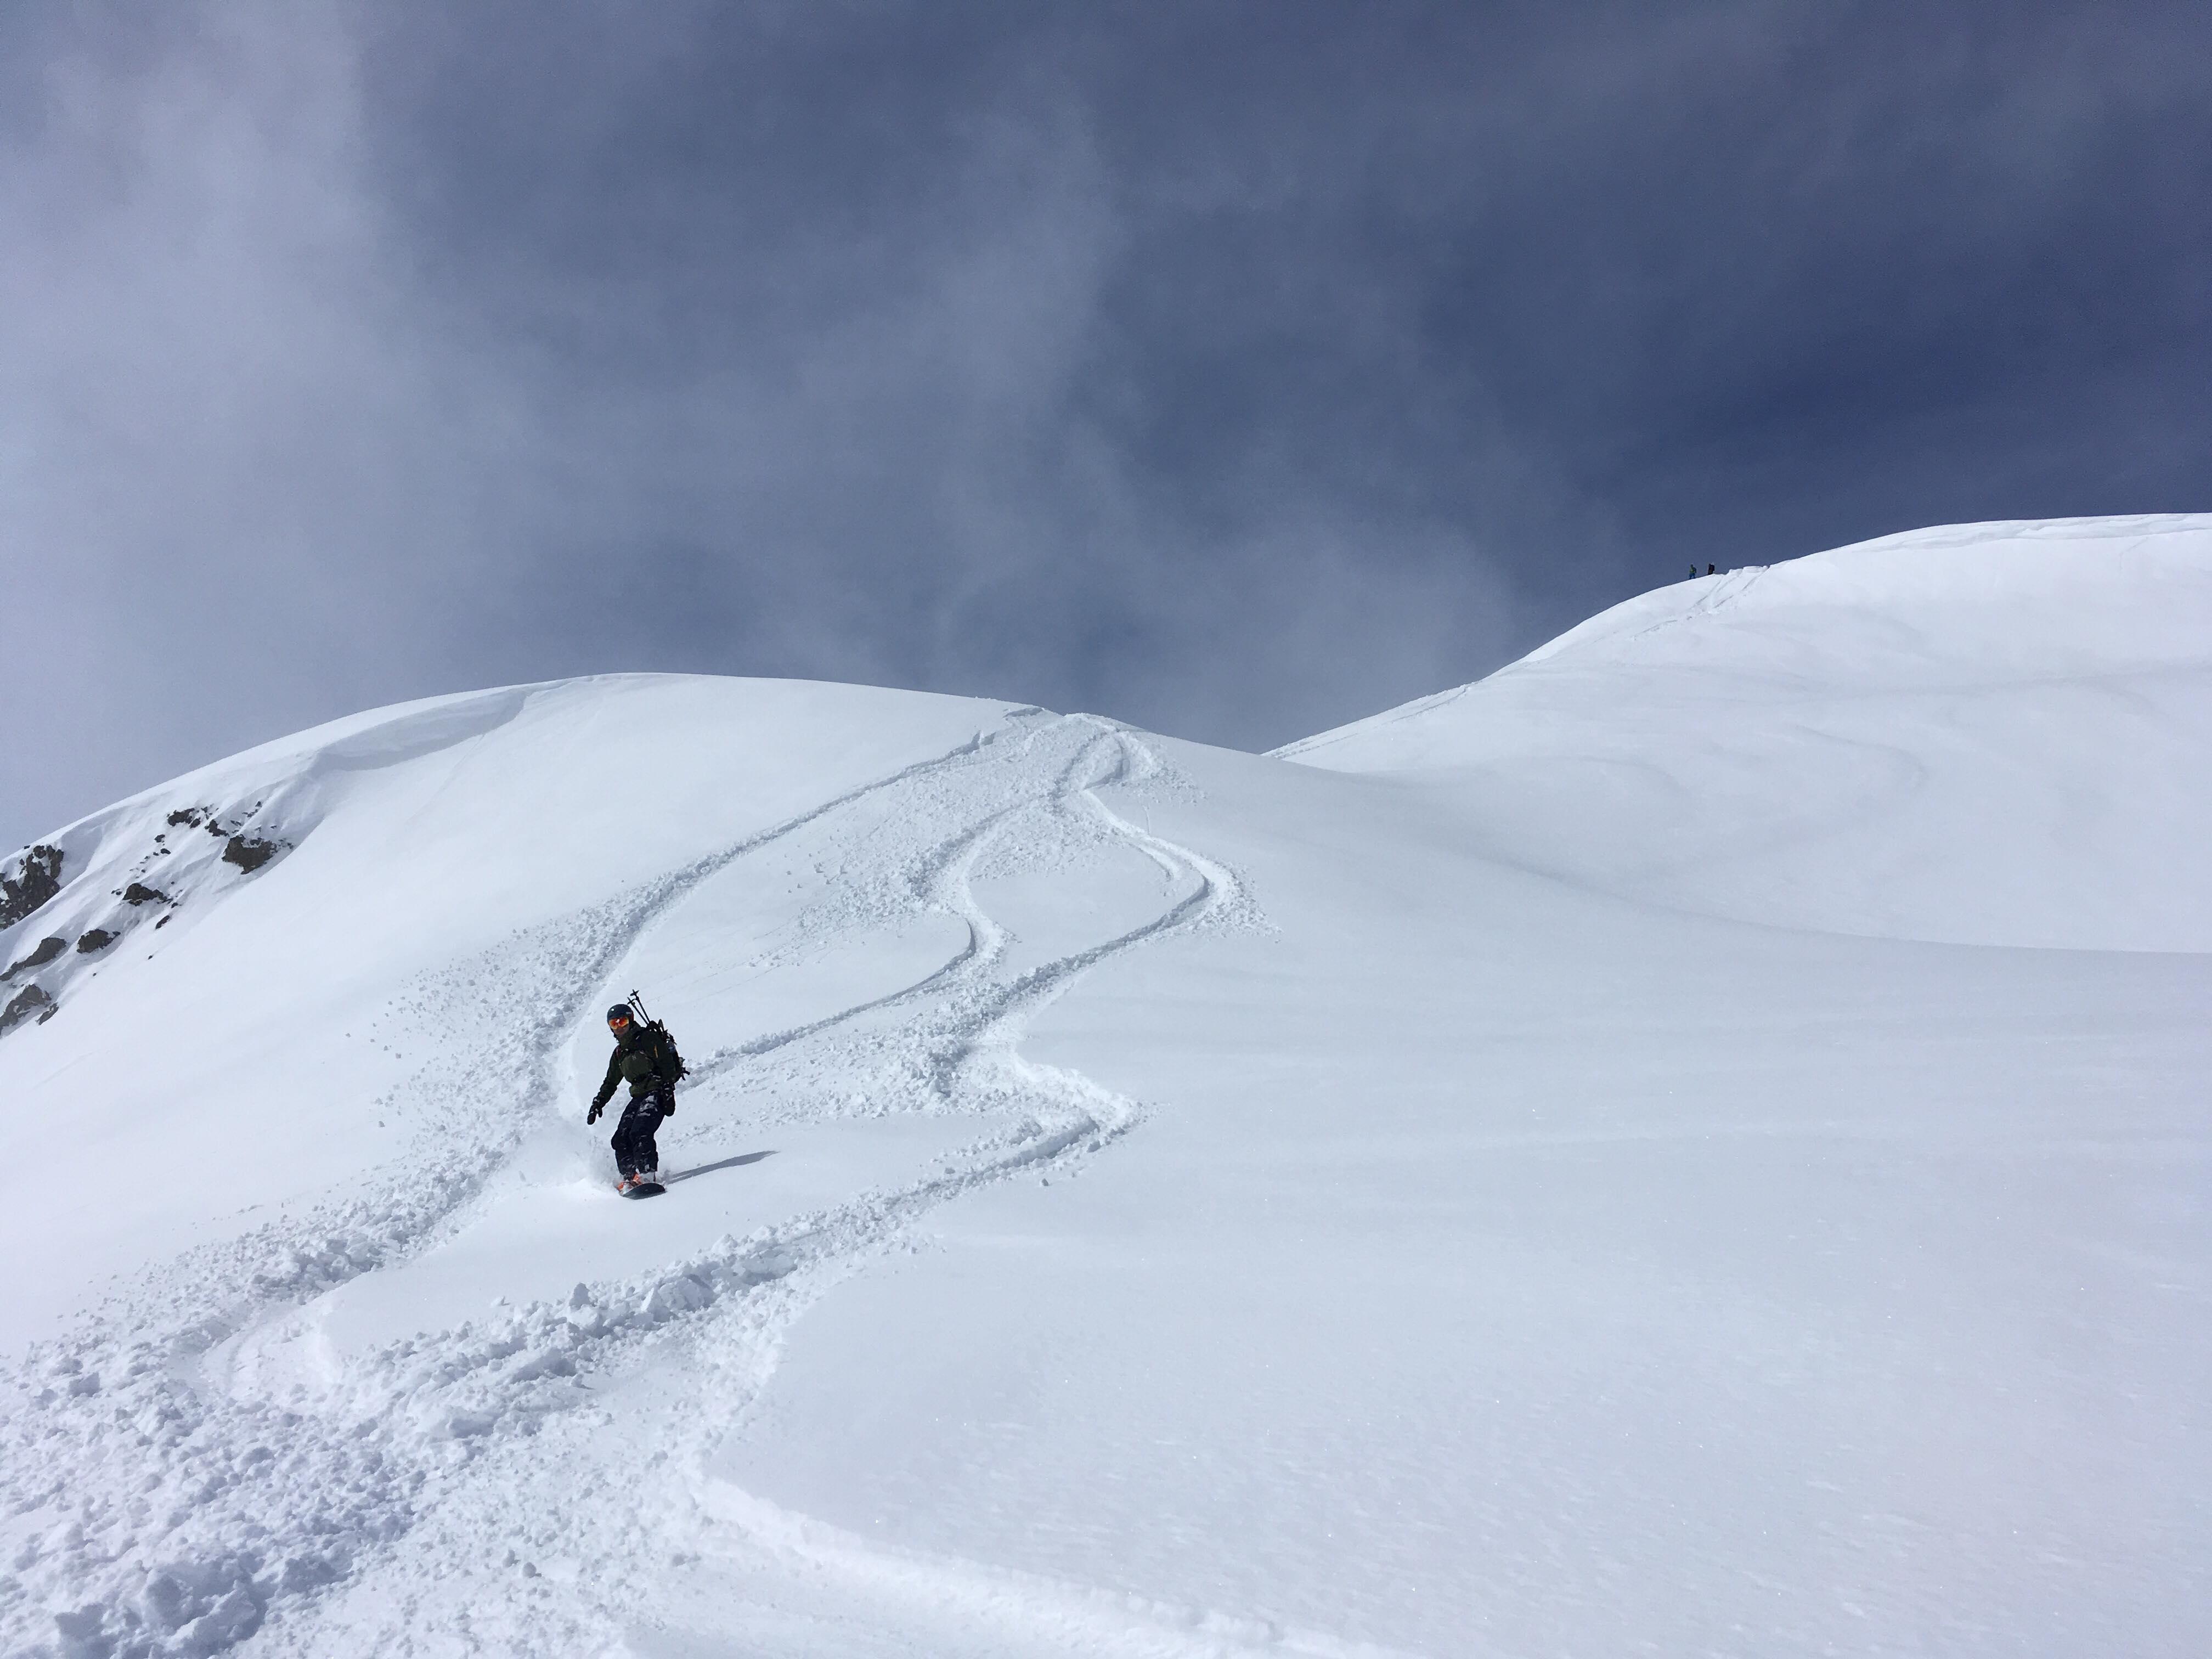 Col de la Louze snowboard 8